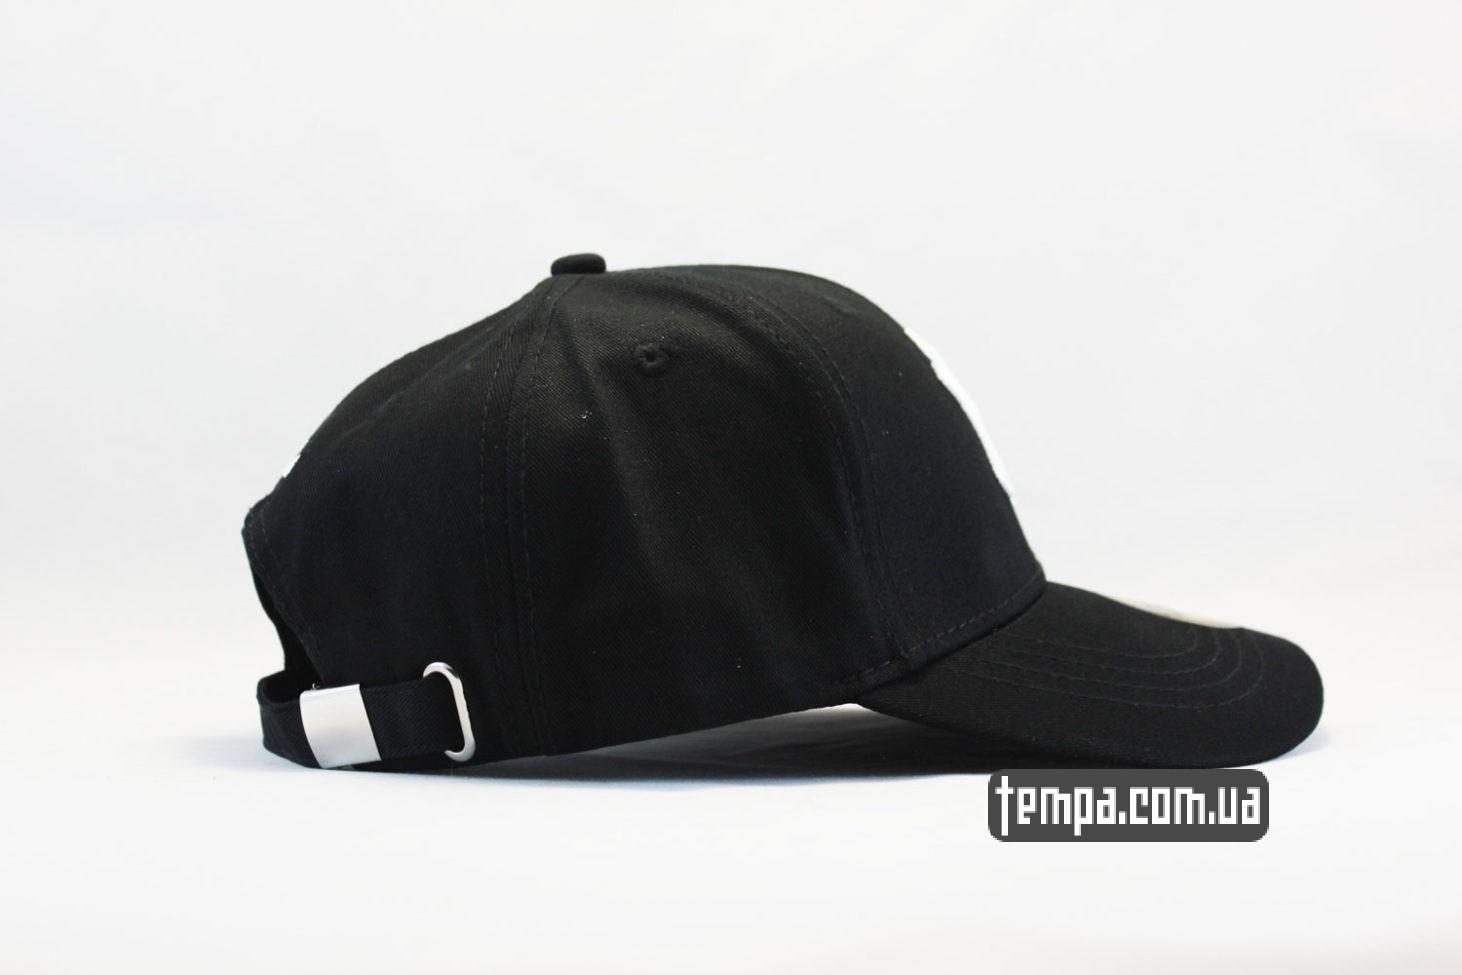 янкис черная кепка бейсболка YANKEES New York New Era черная